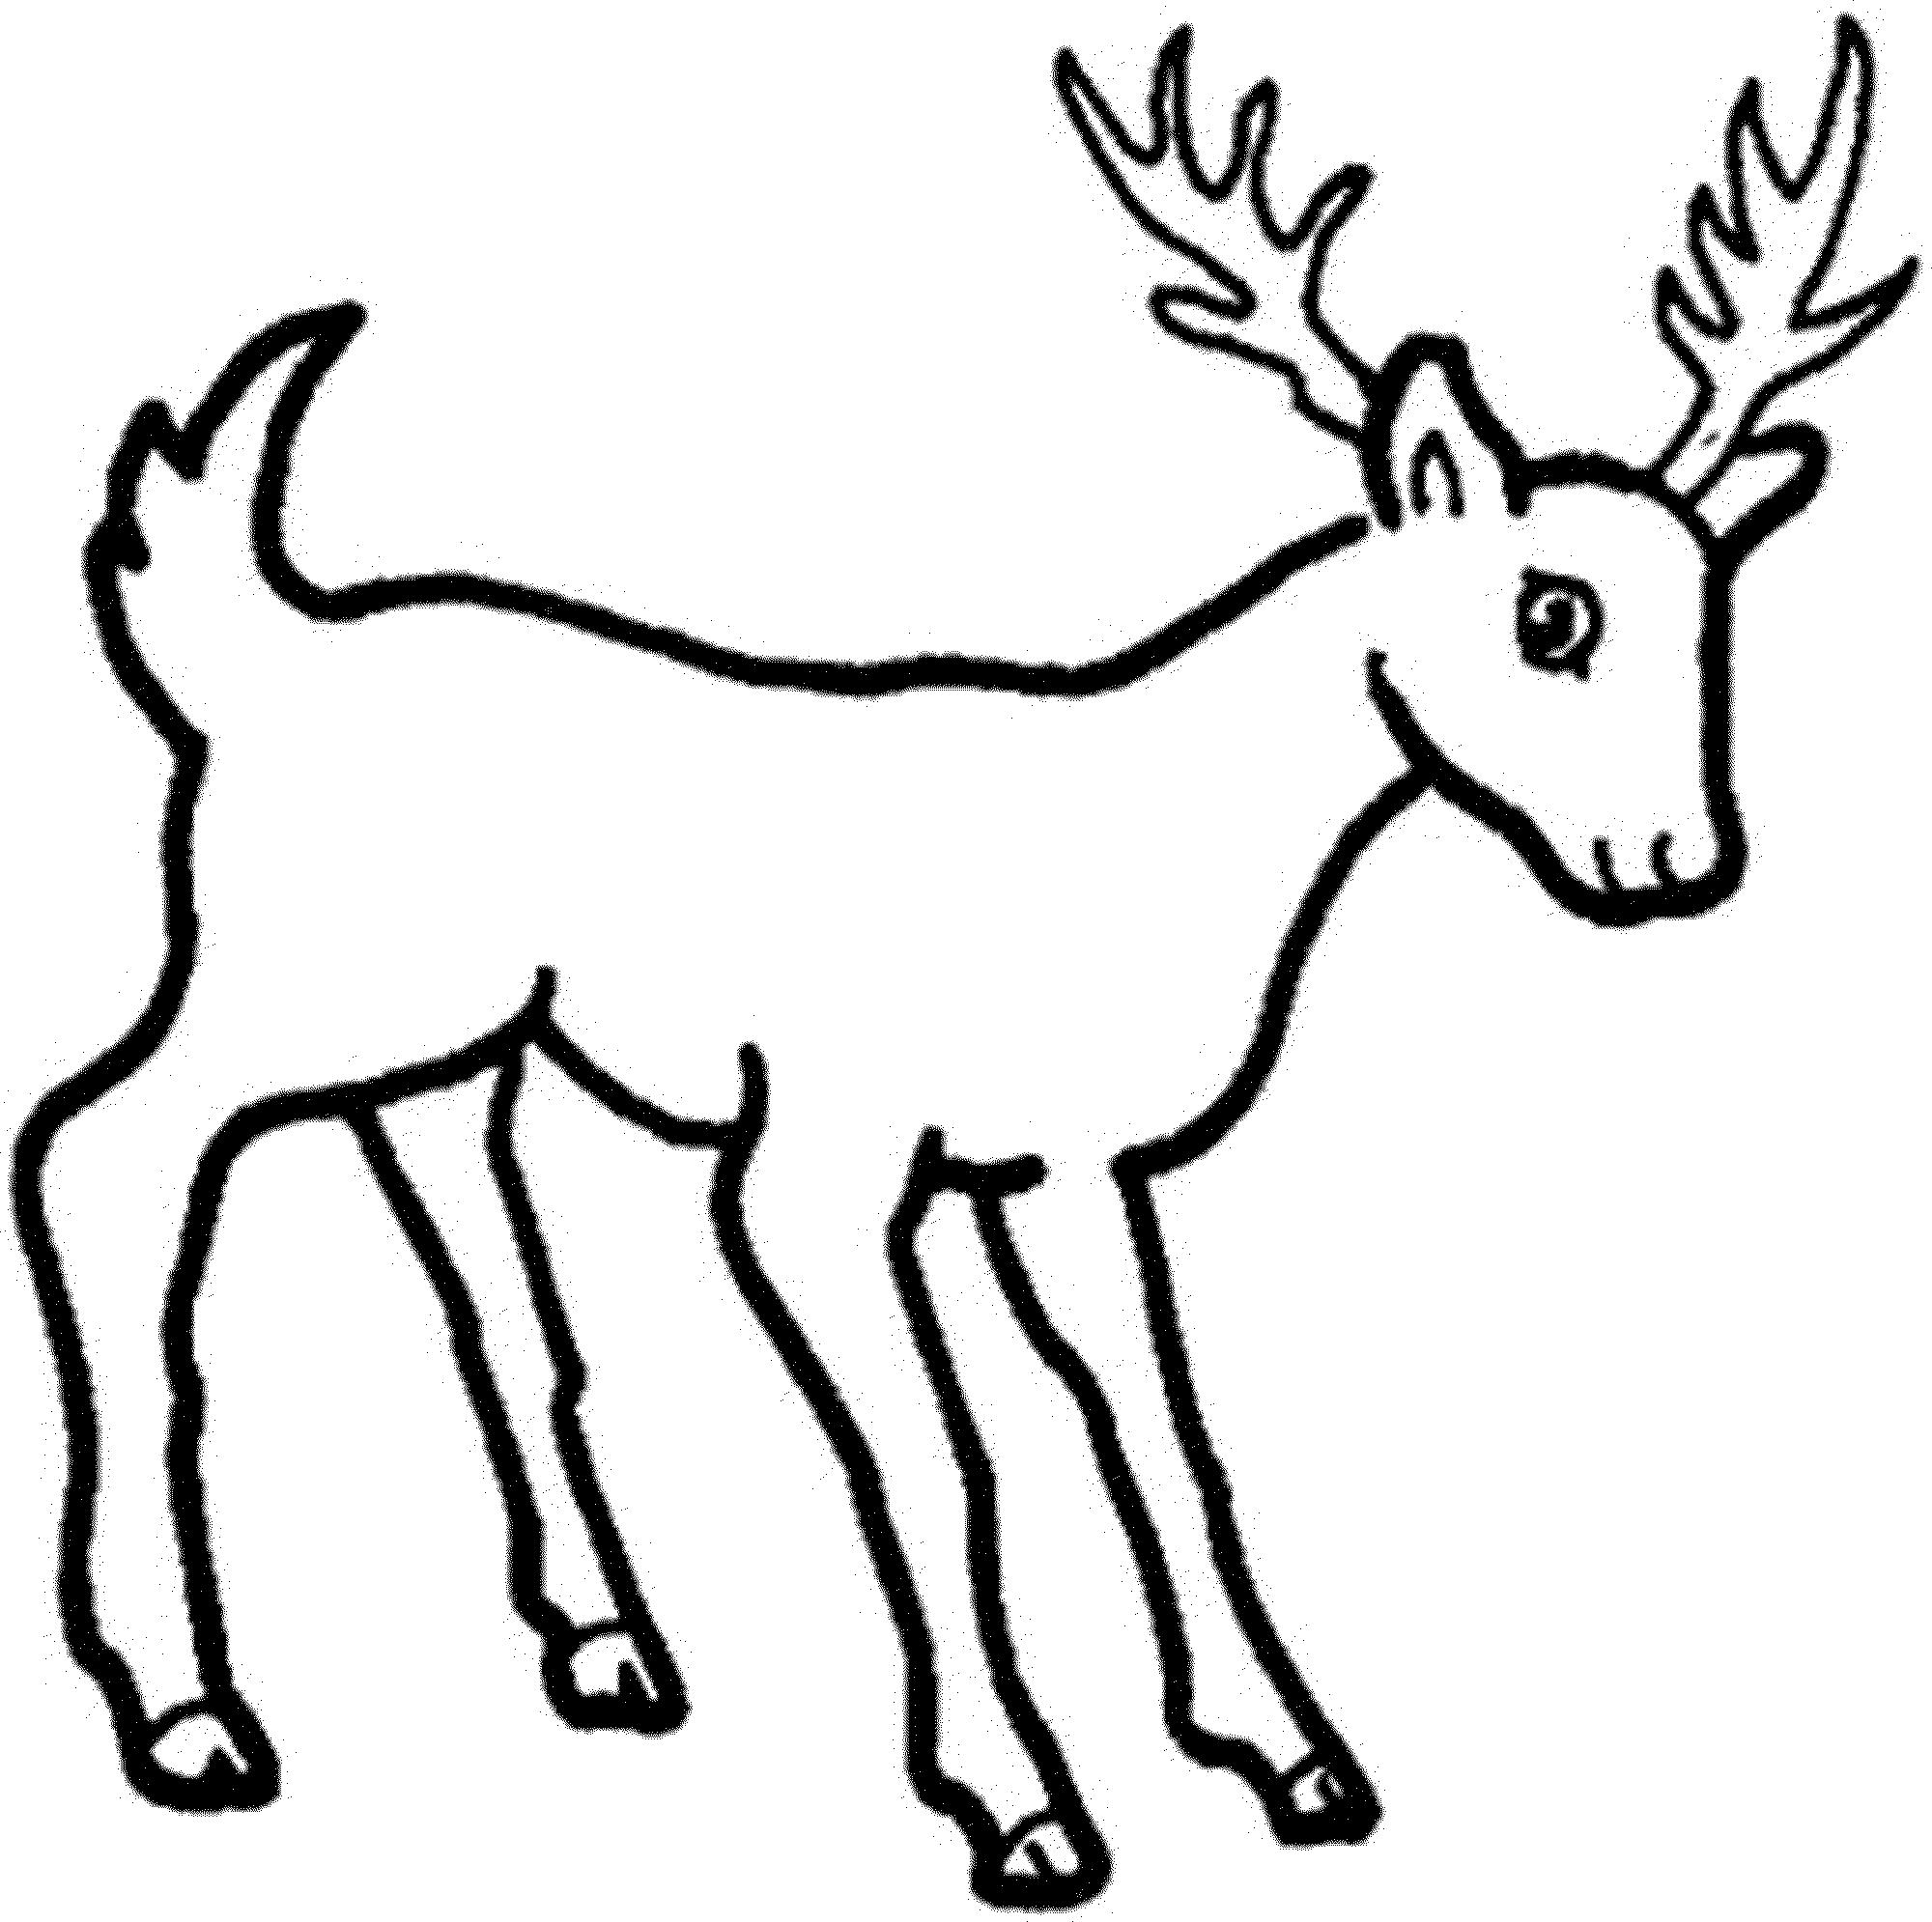 2000x1990 Cartoon Deer Coloring Pages